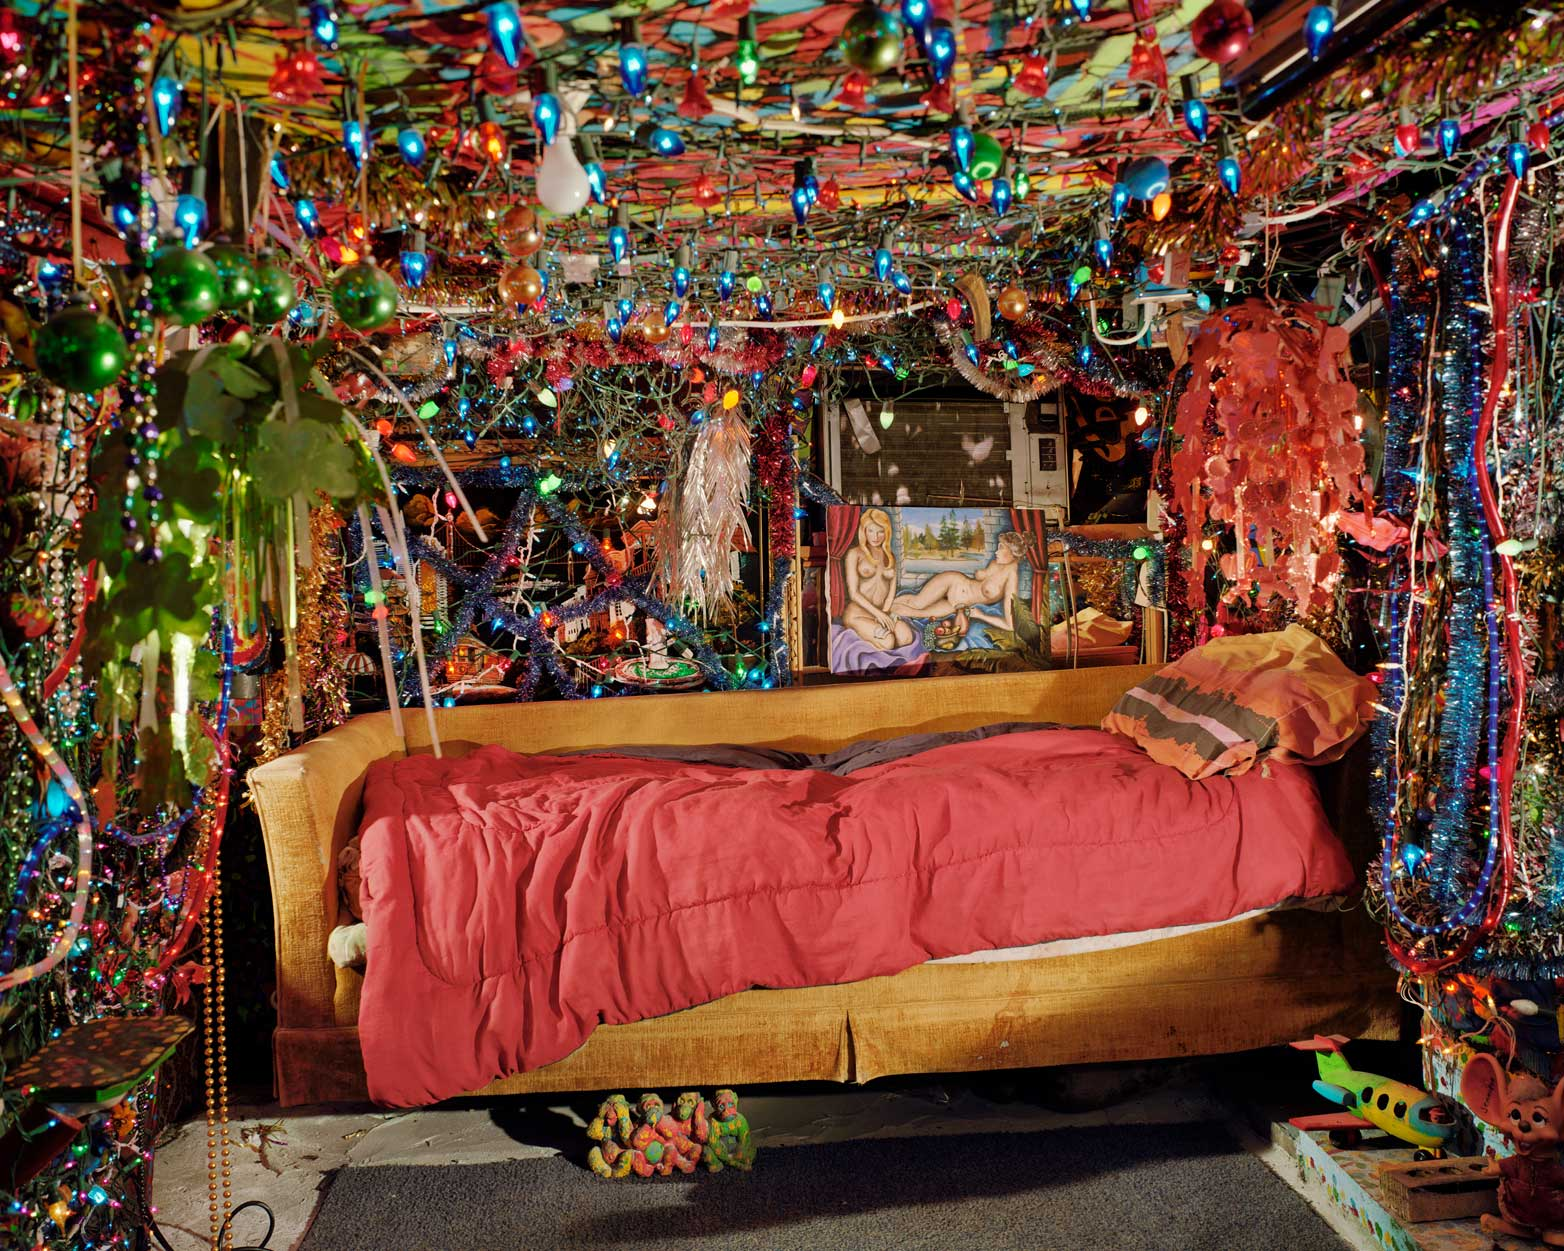 Herman's Bed, Kenner, LA, 2002